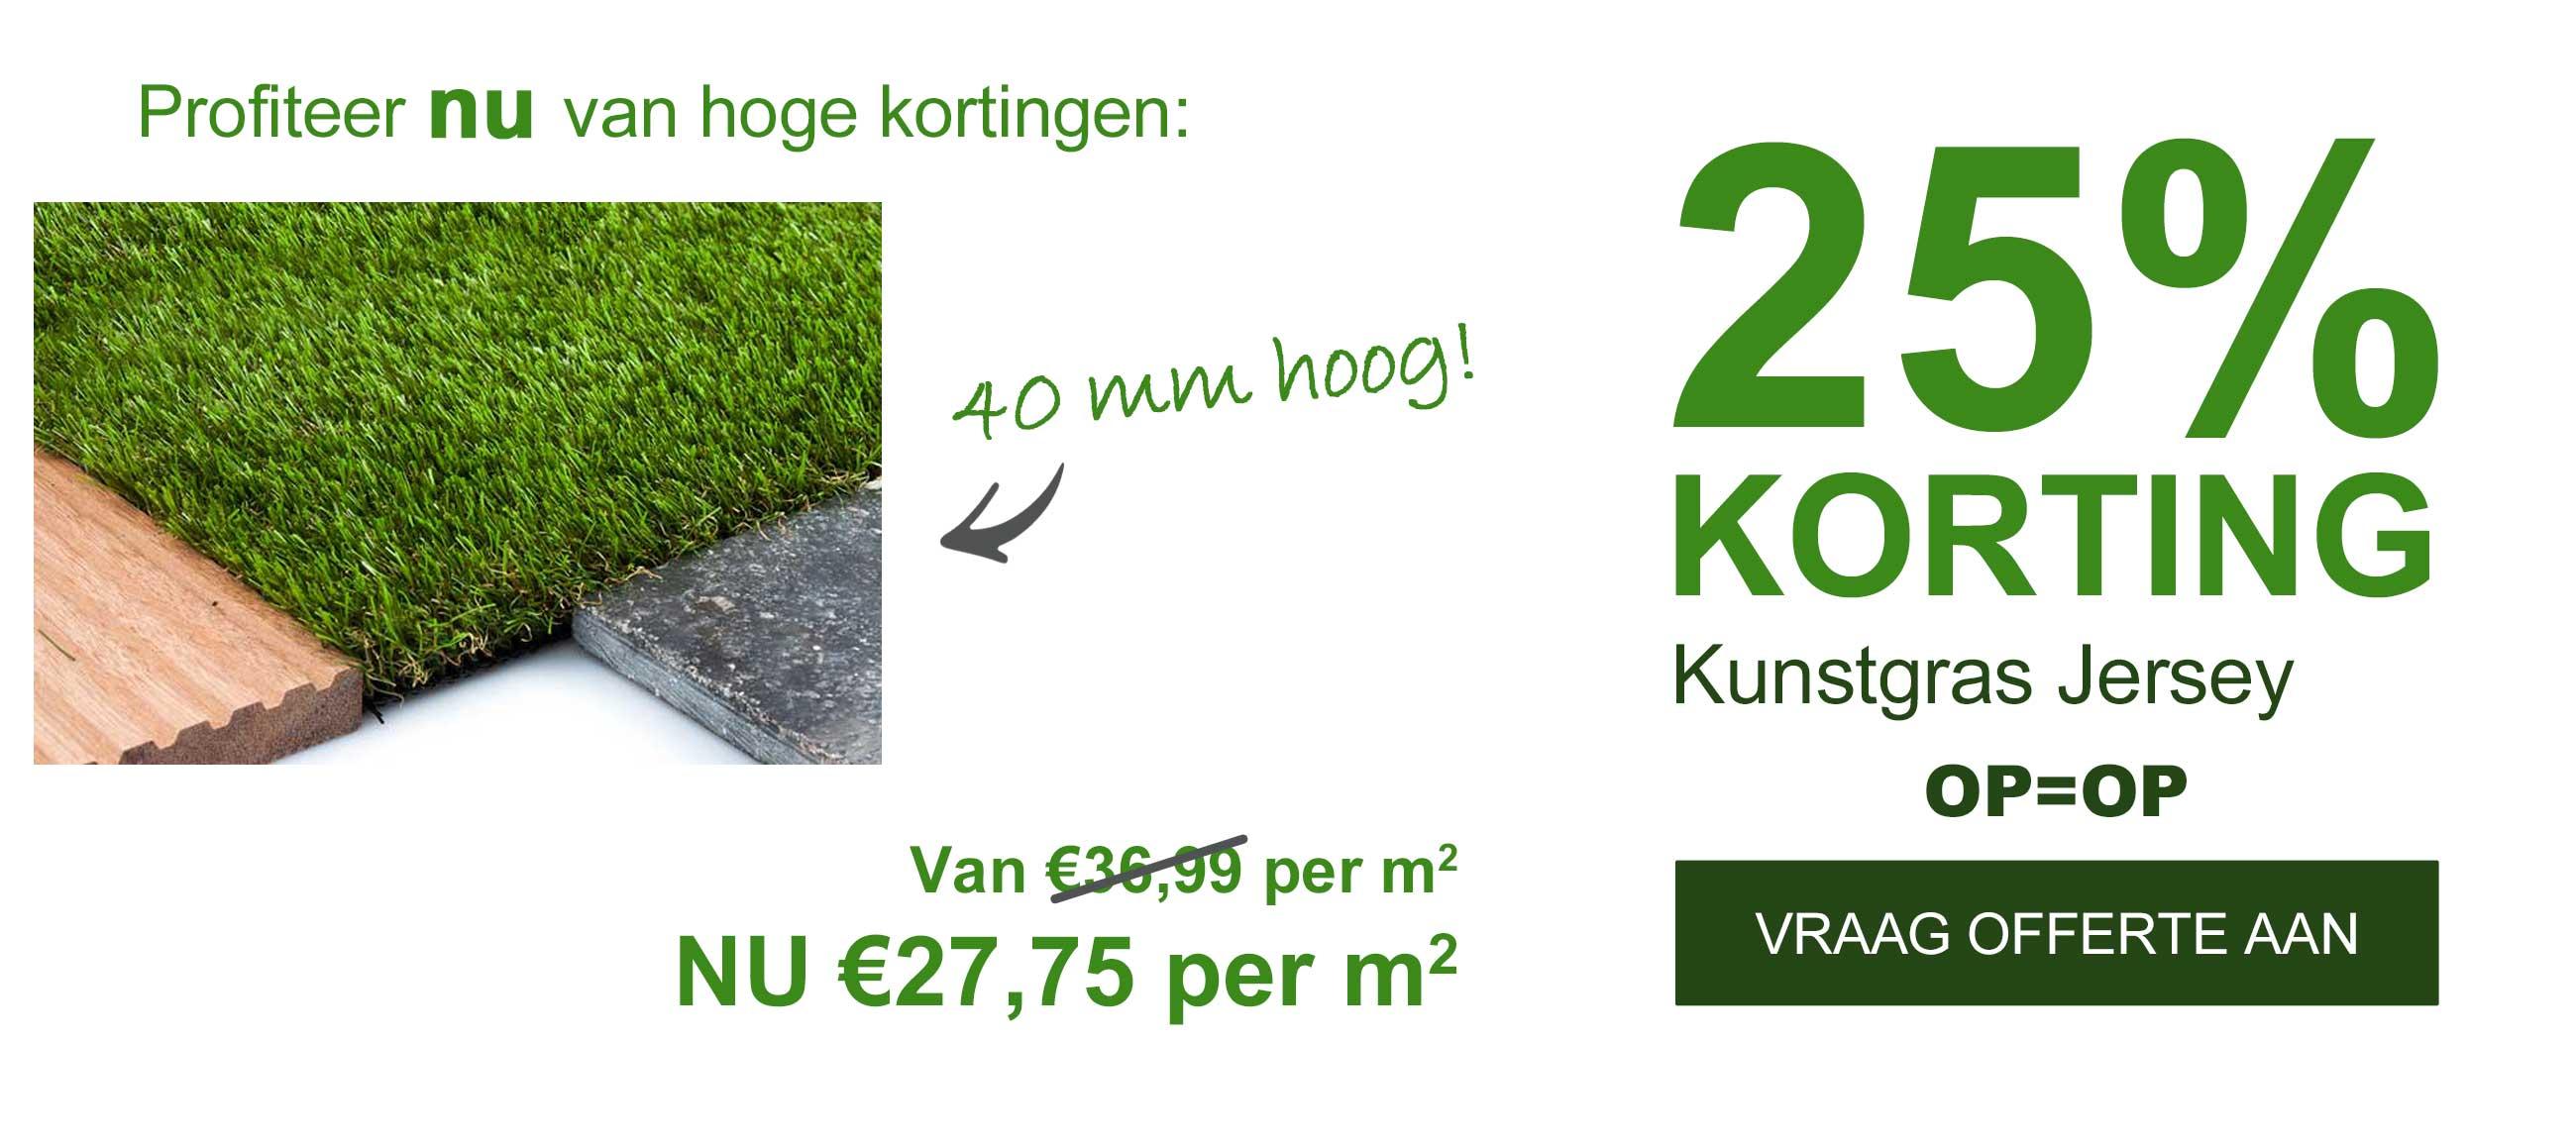 Opruiming!! 25% Korting Op Kunstgras Jersey